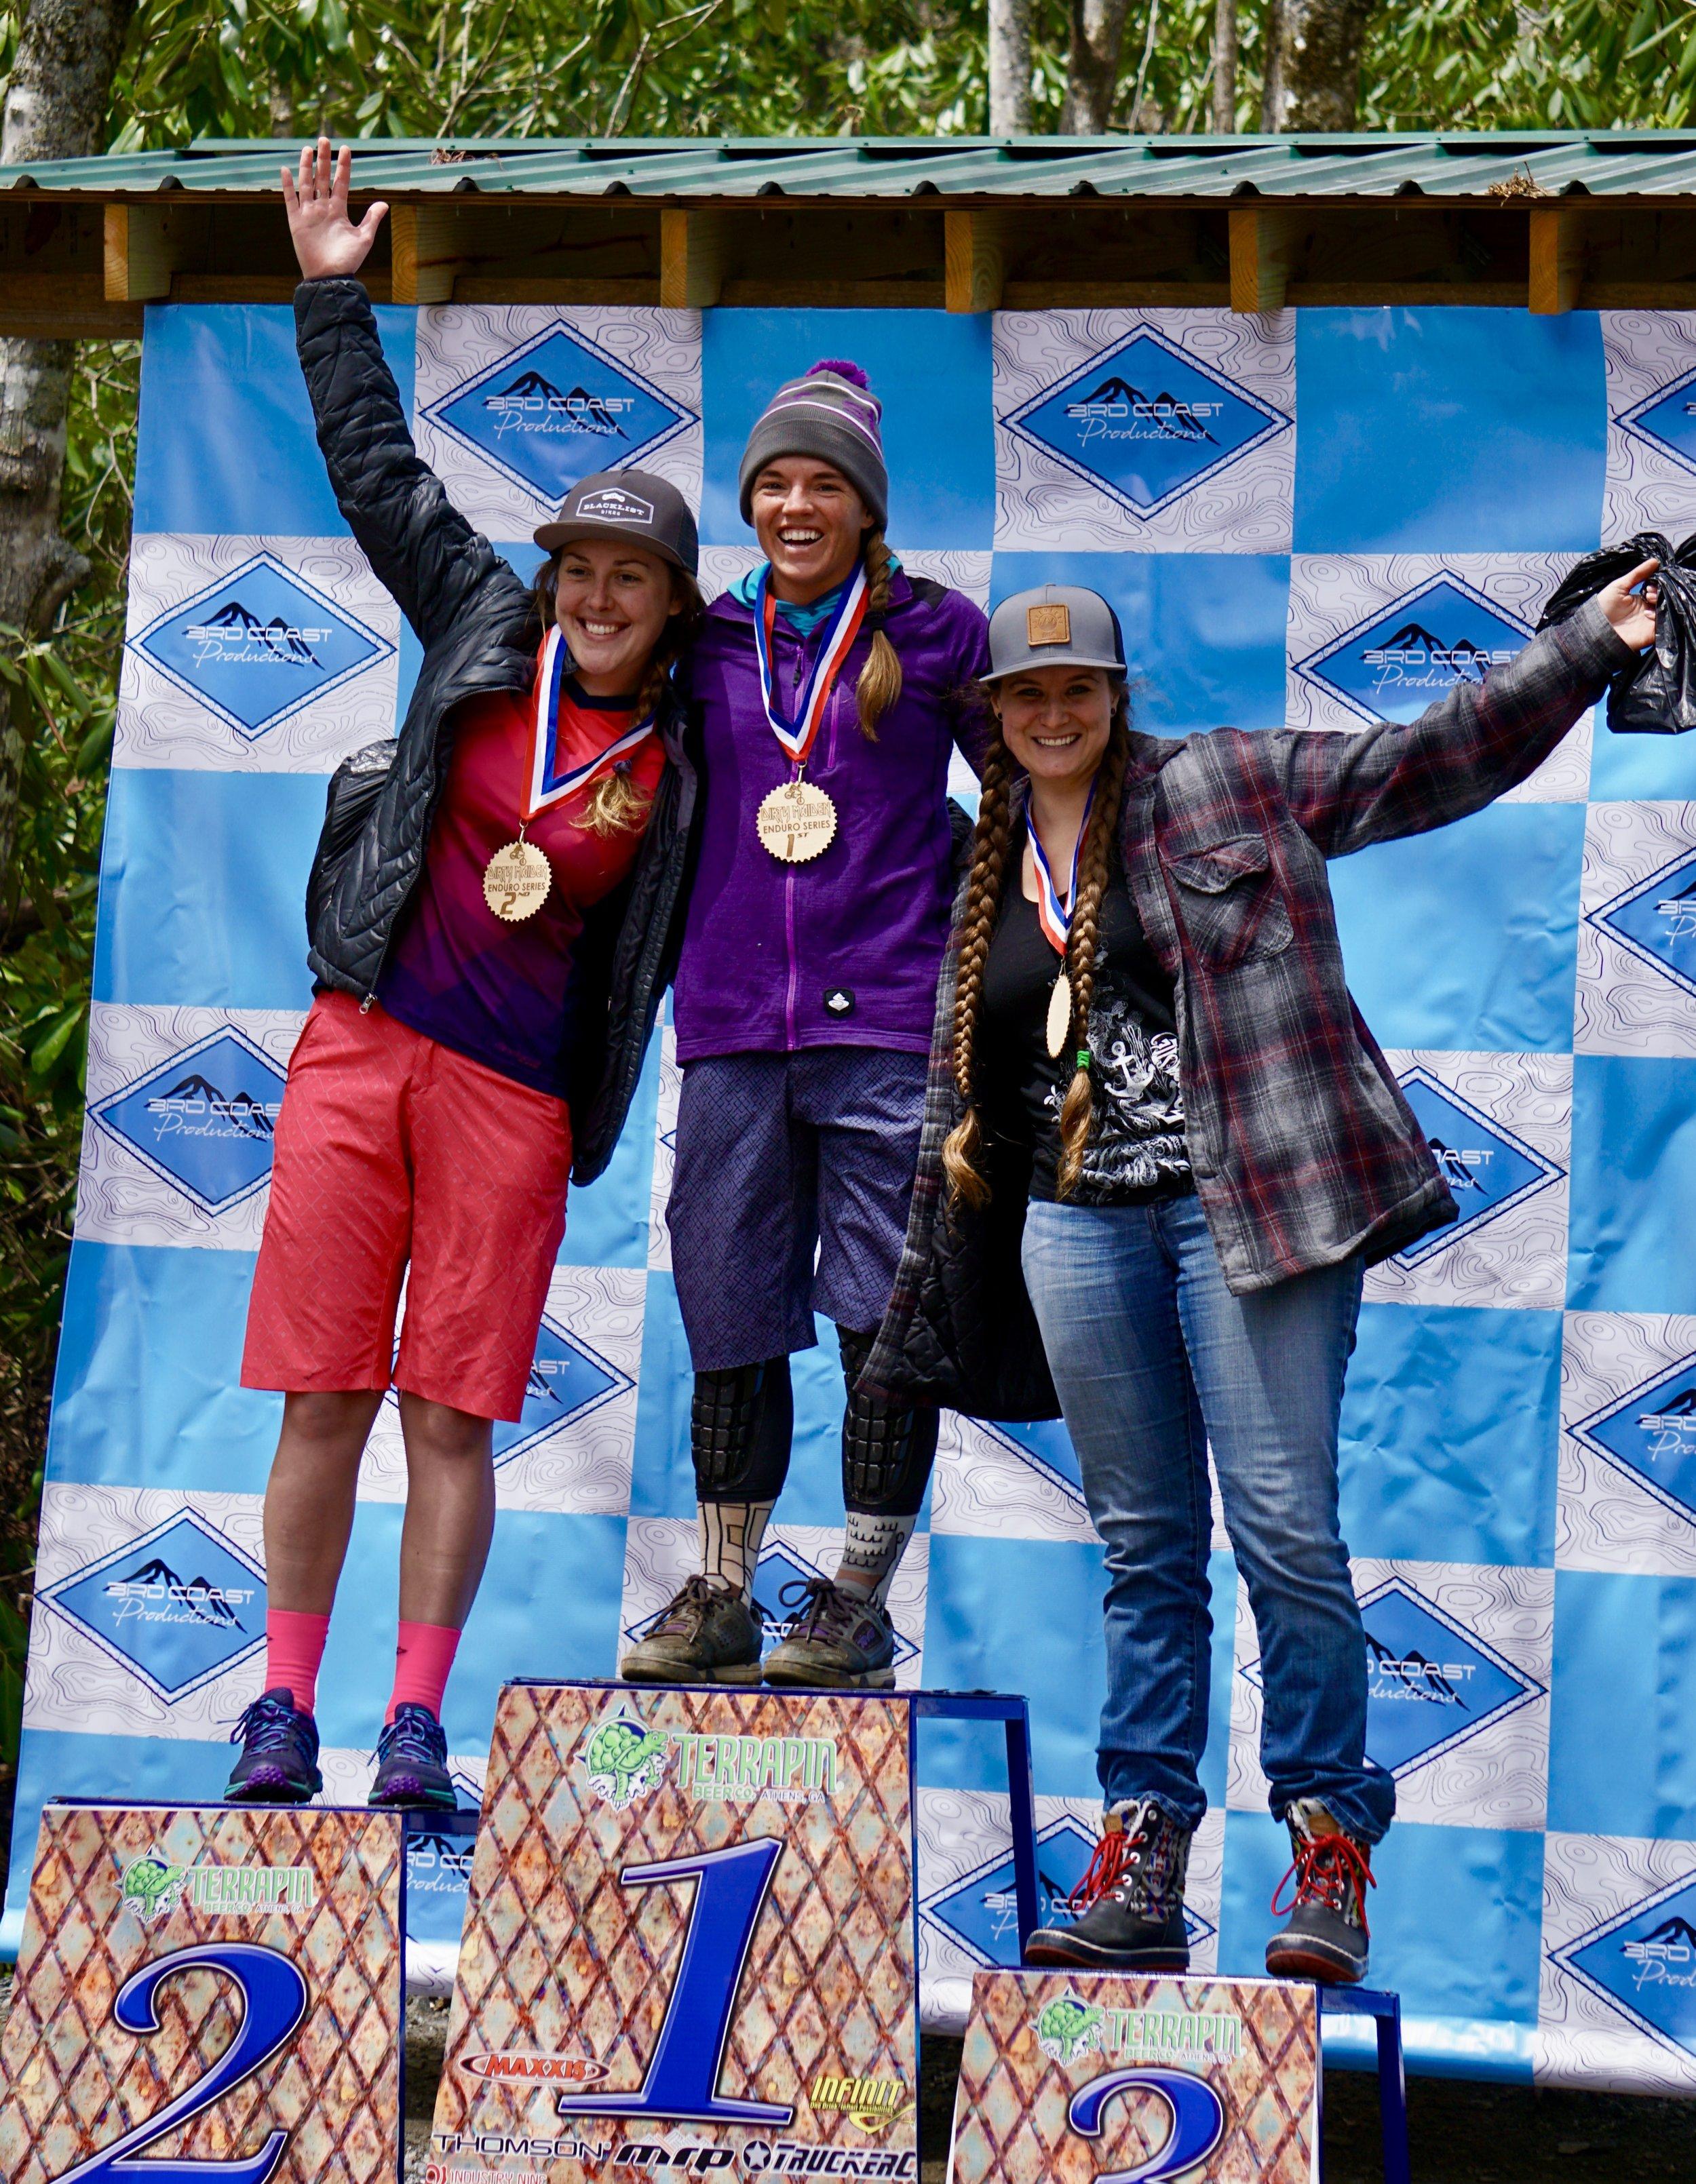 1st place - Fire Mountain Womens' Enduro, NC